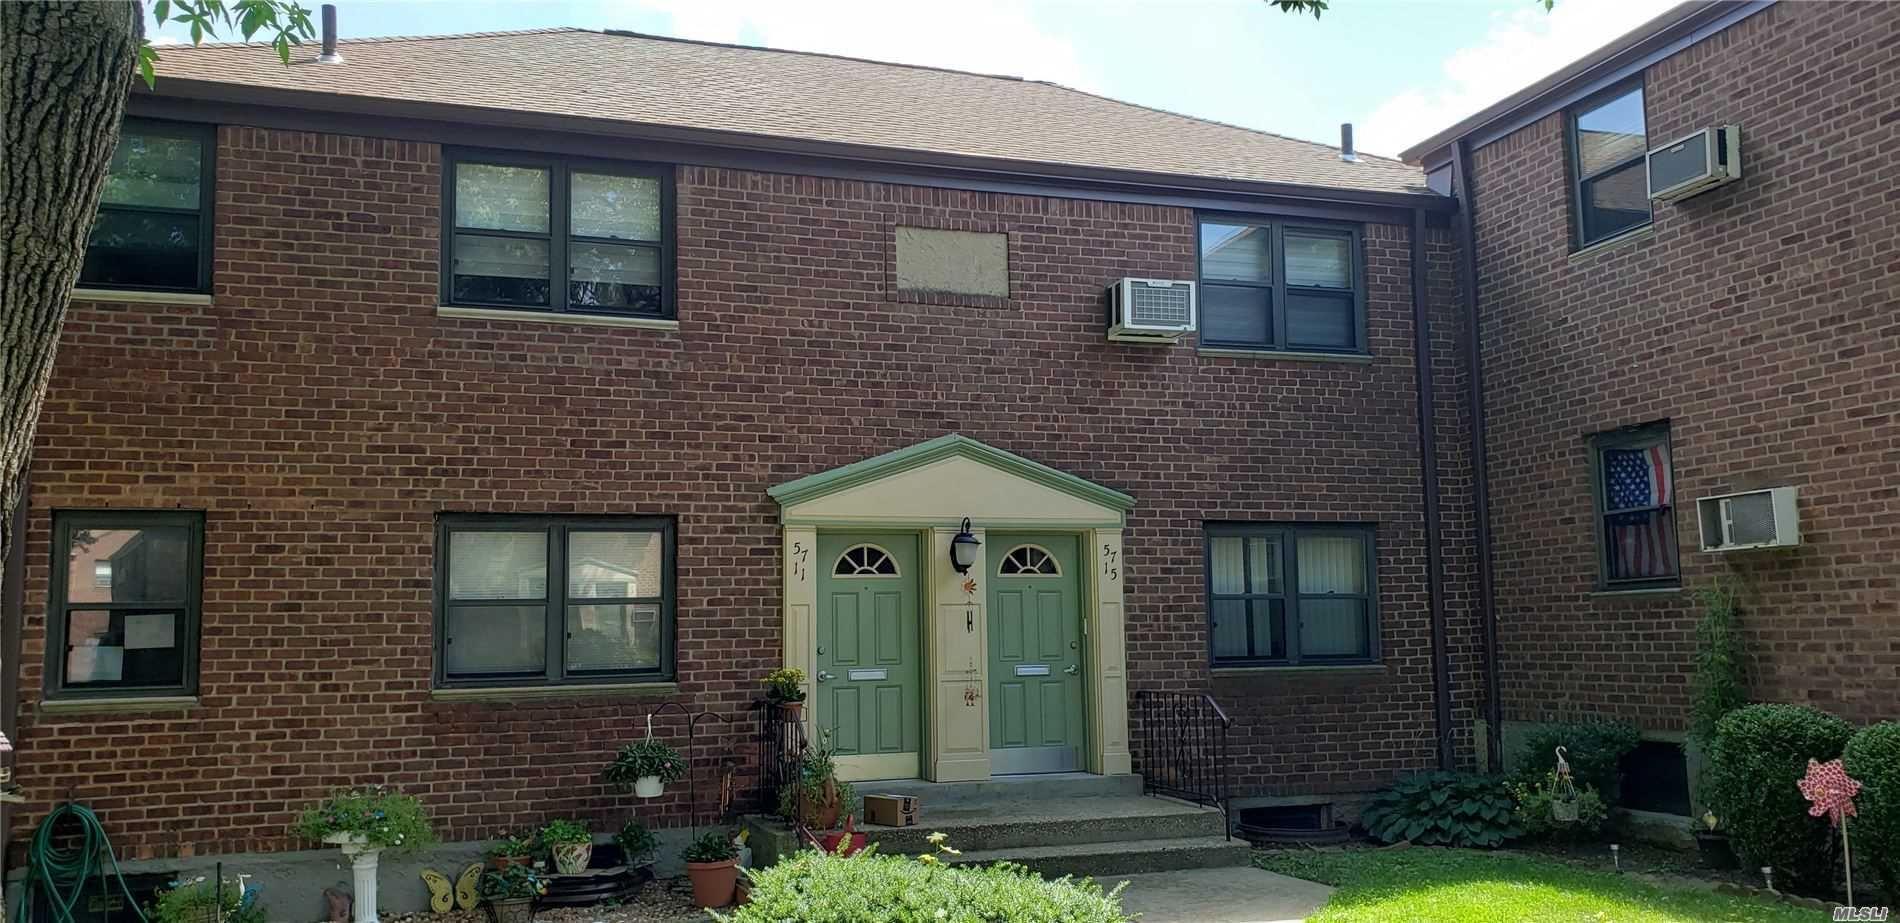 57-15 246 Crescent #Lower, Douglaston, NY 11362 - MLS#: 3106357